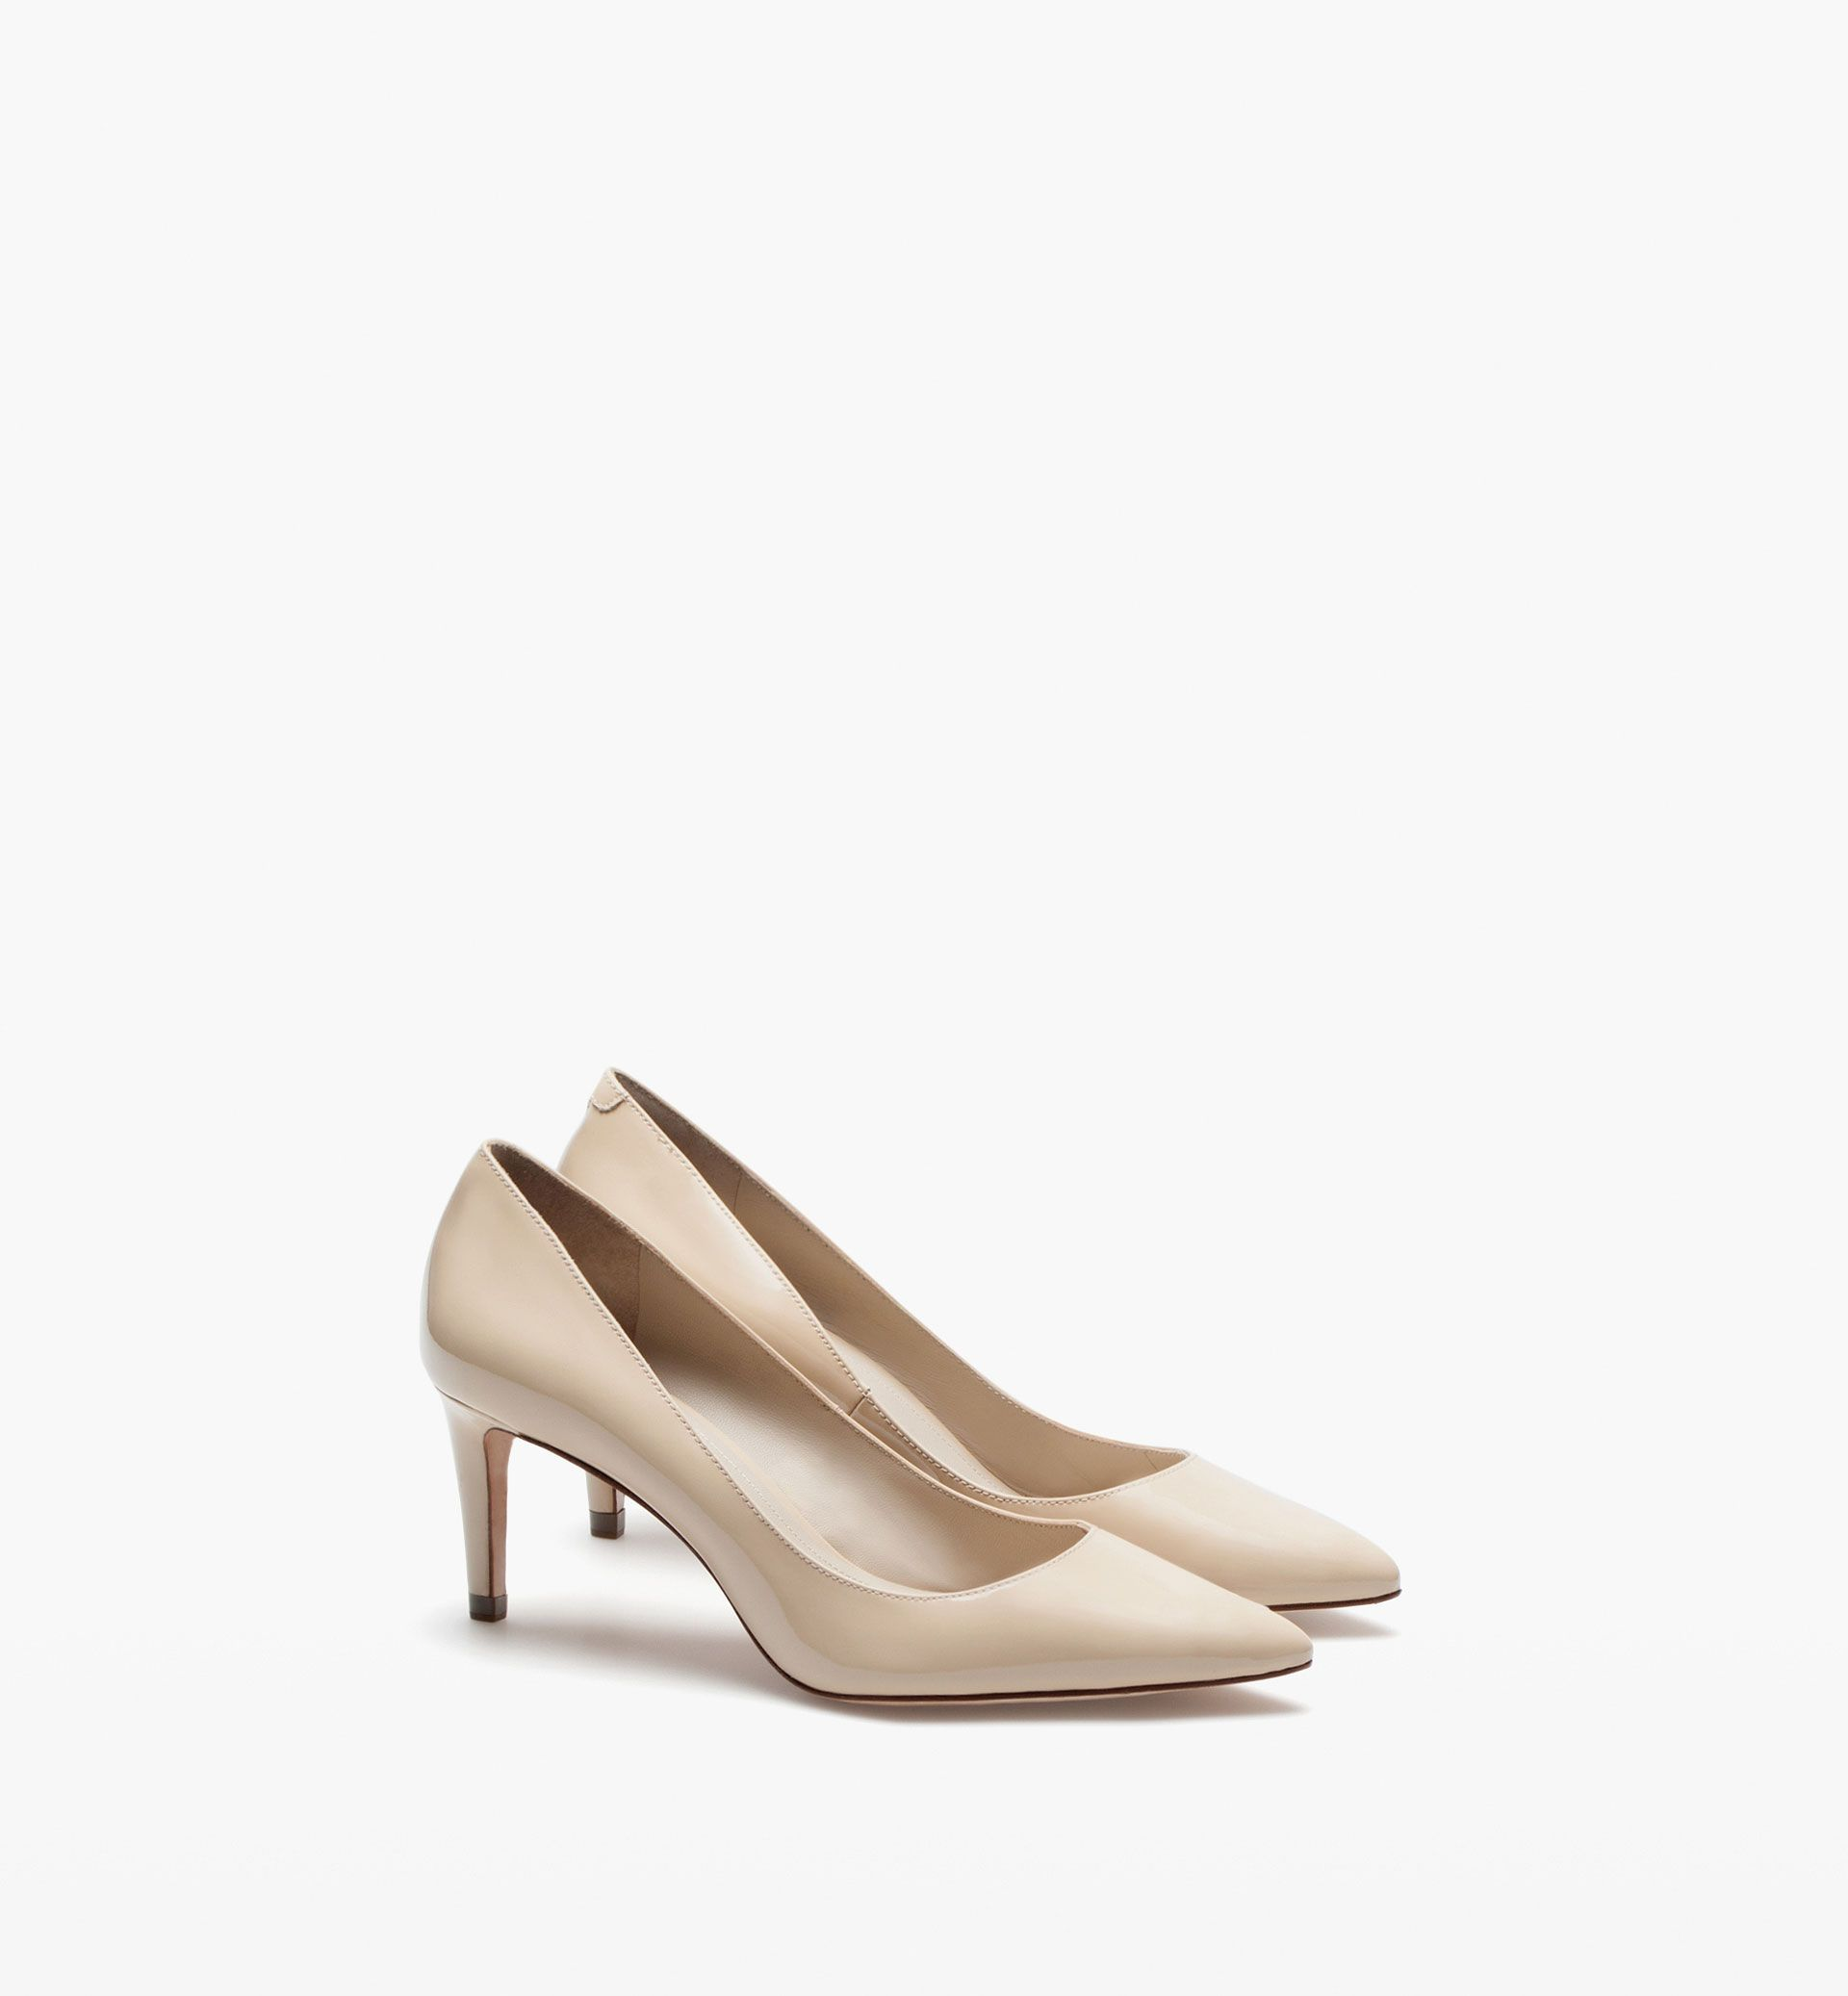 Zapatos Salón Nude Charol DuttiEn Massimo De 2019 4ALj53qR